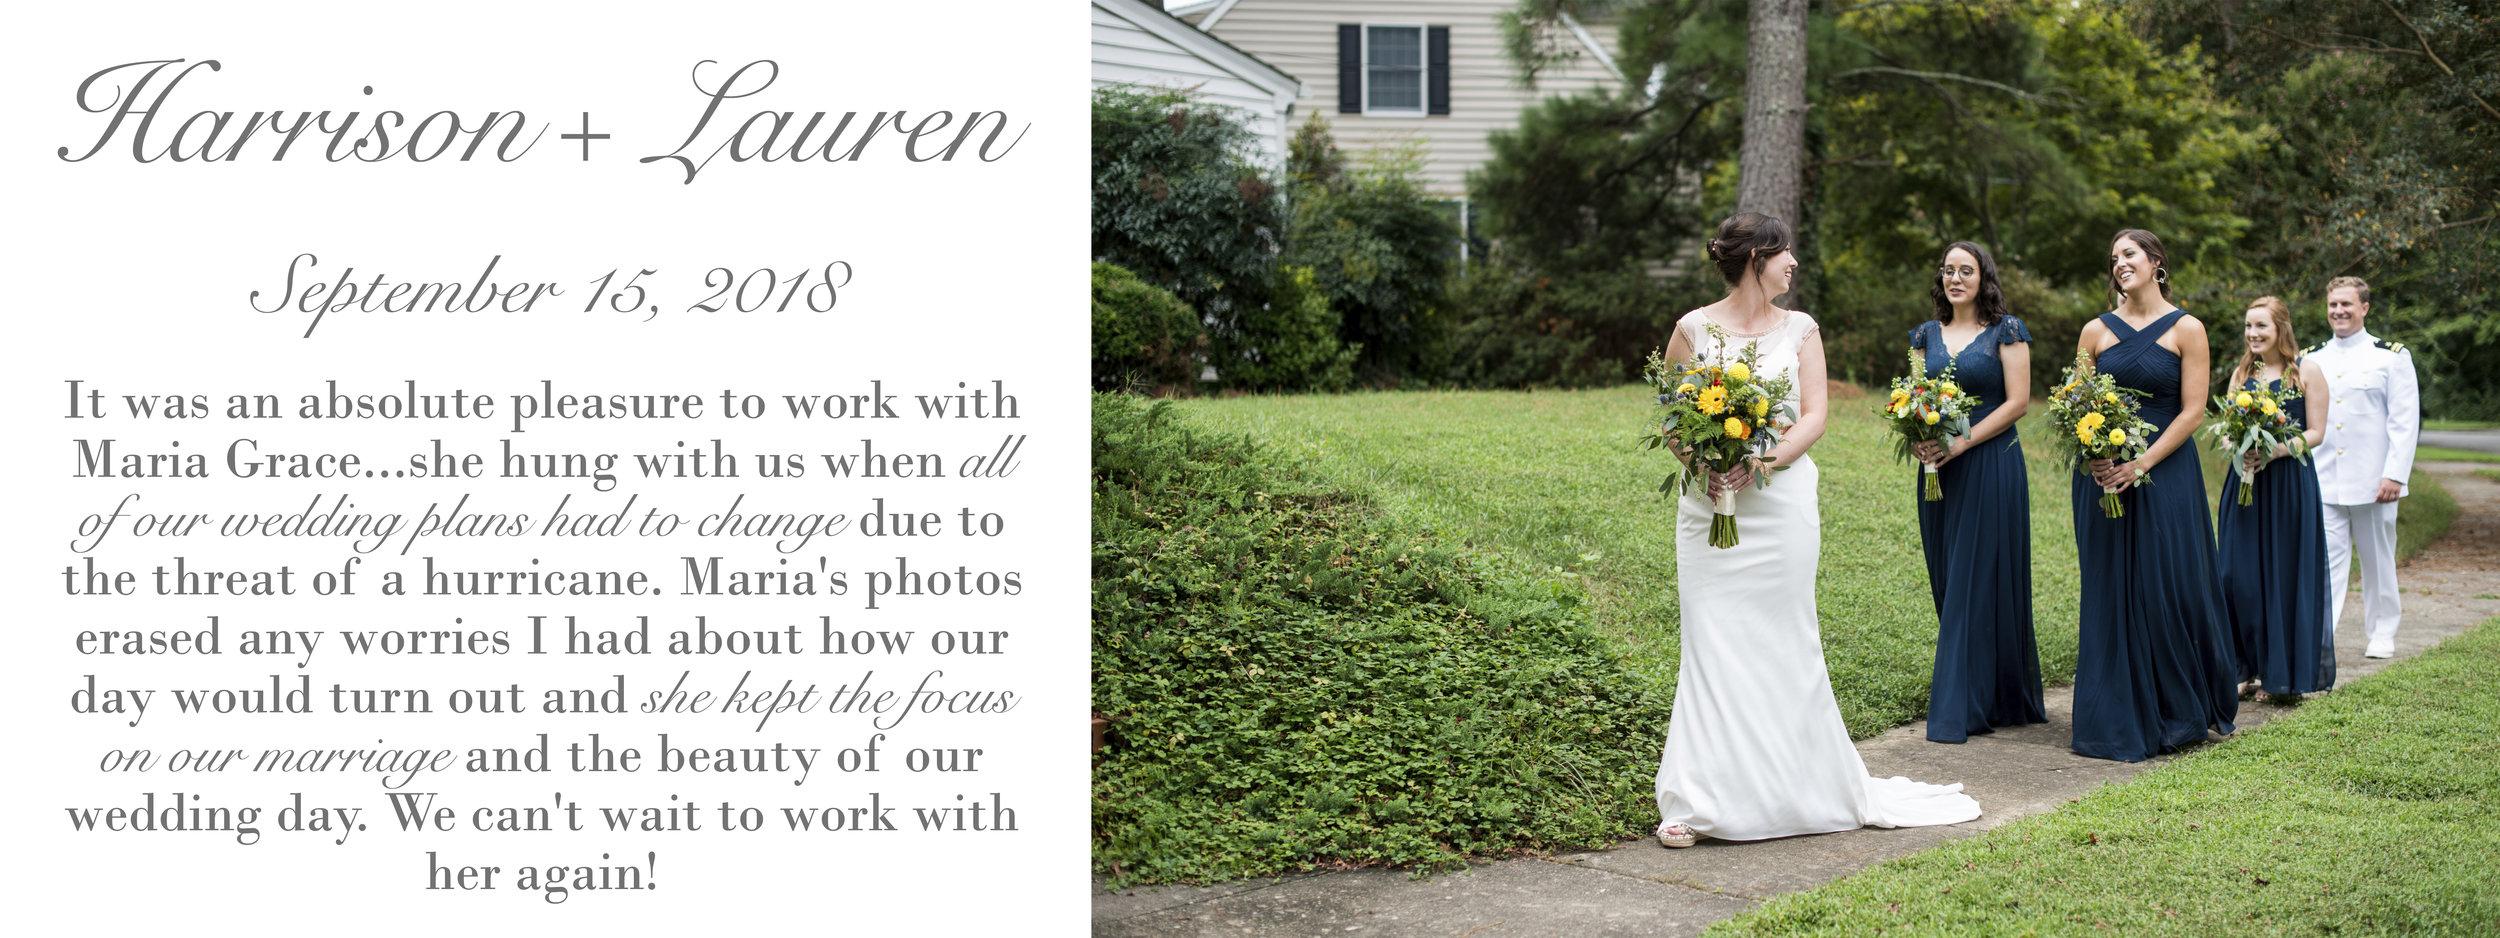 Harrison&Lauren.jpg